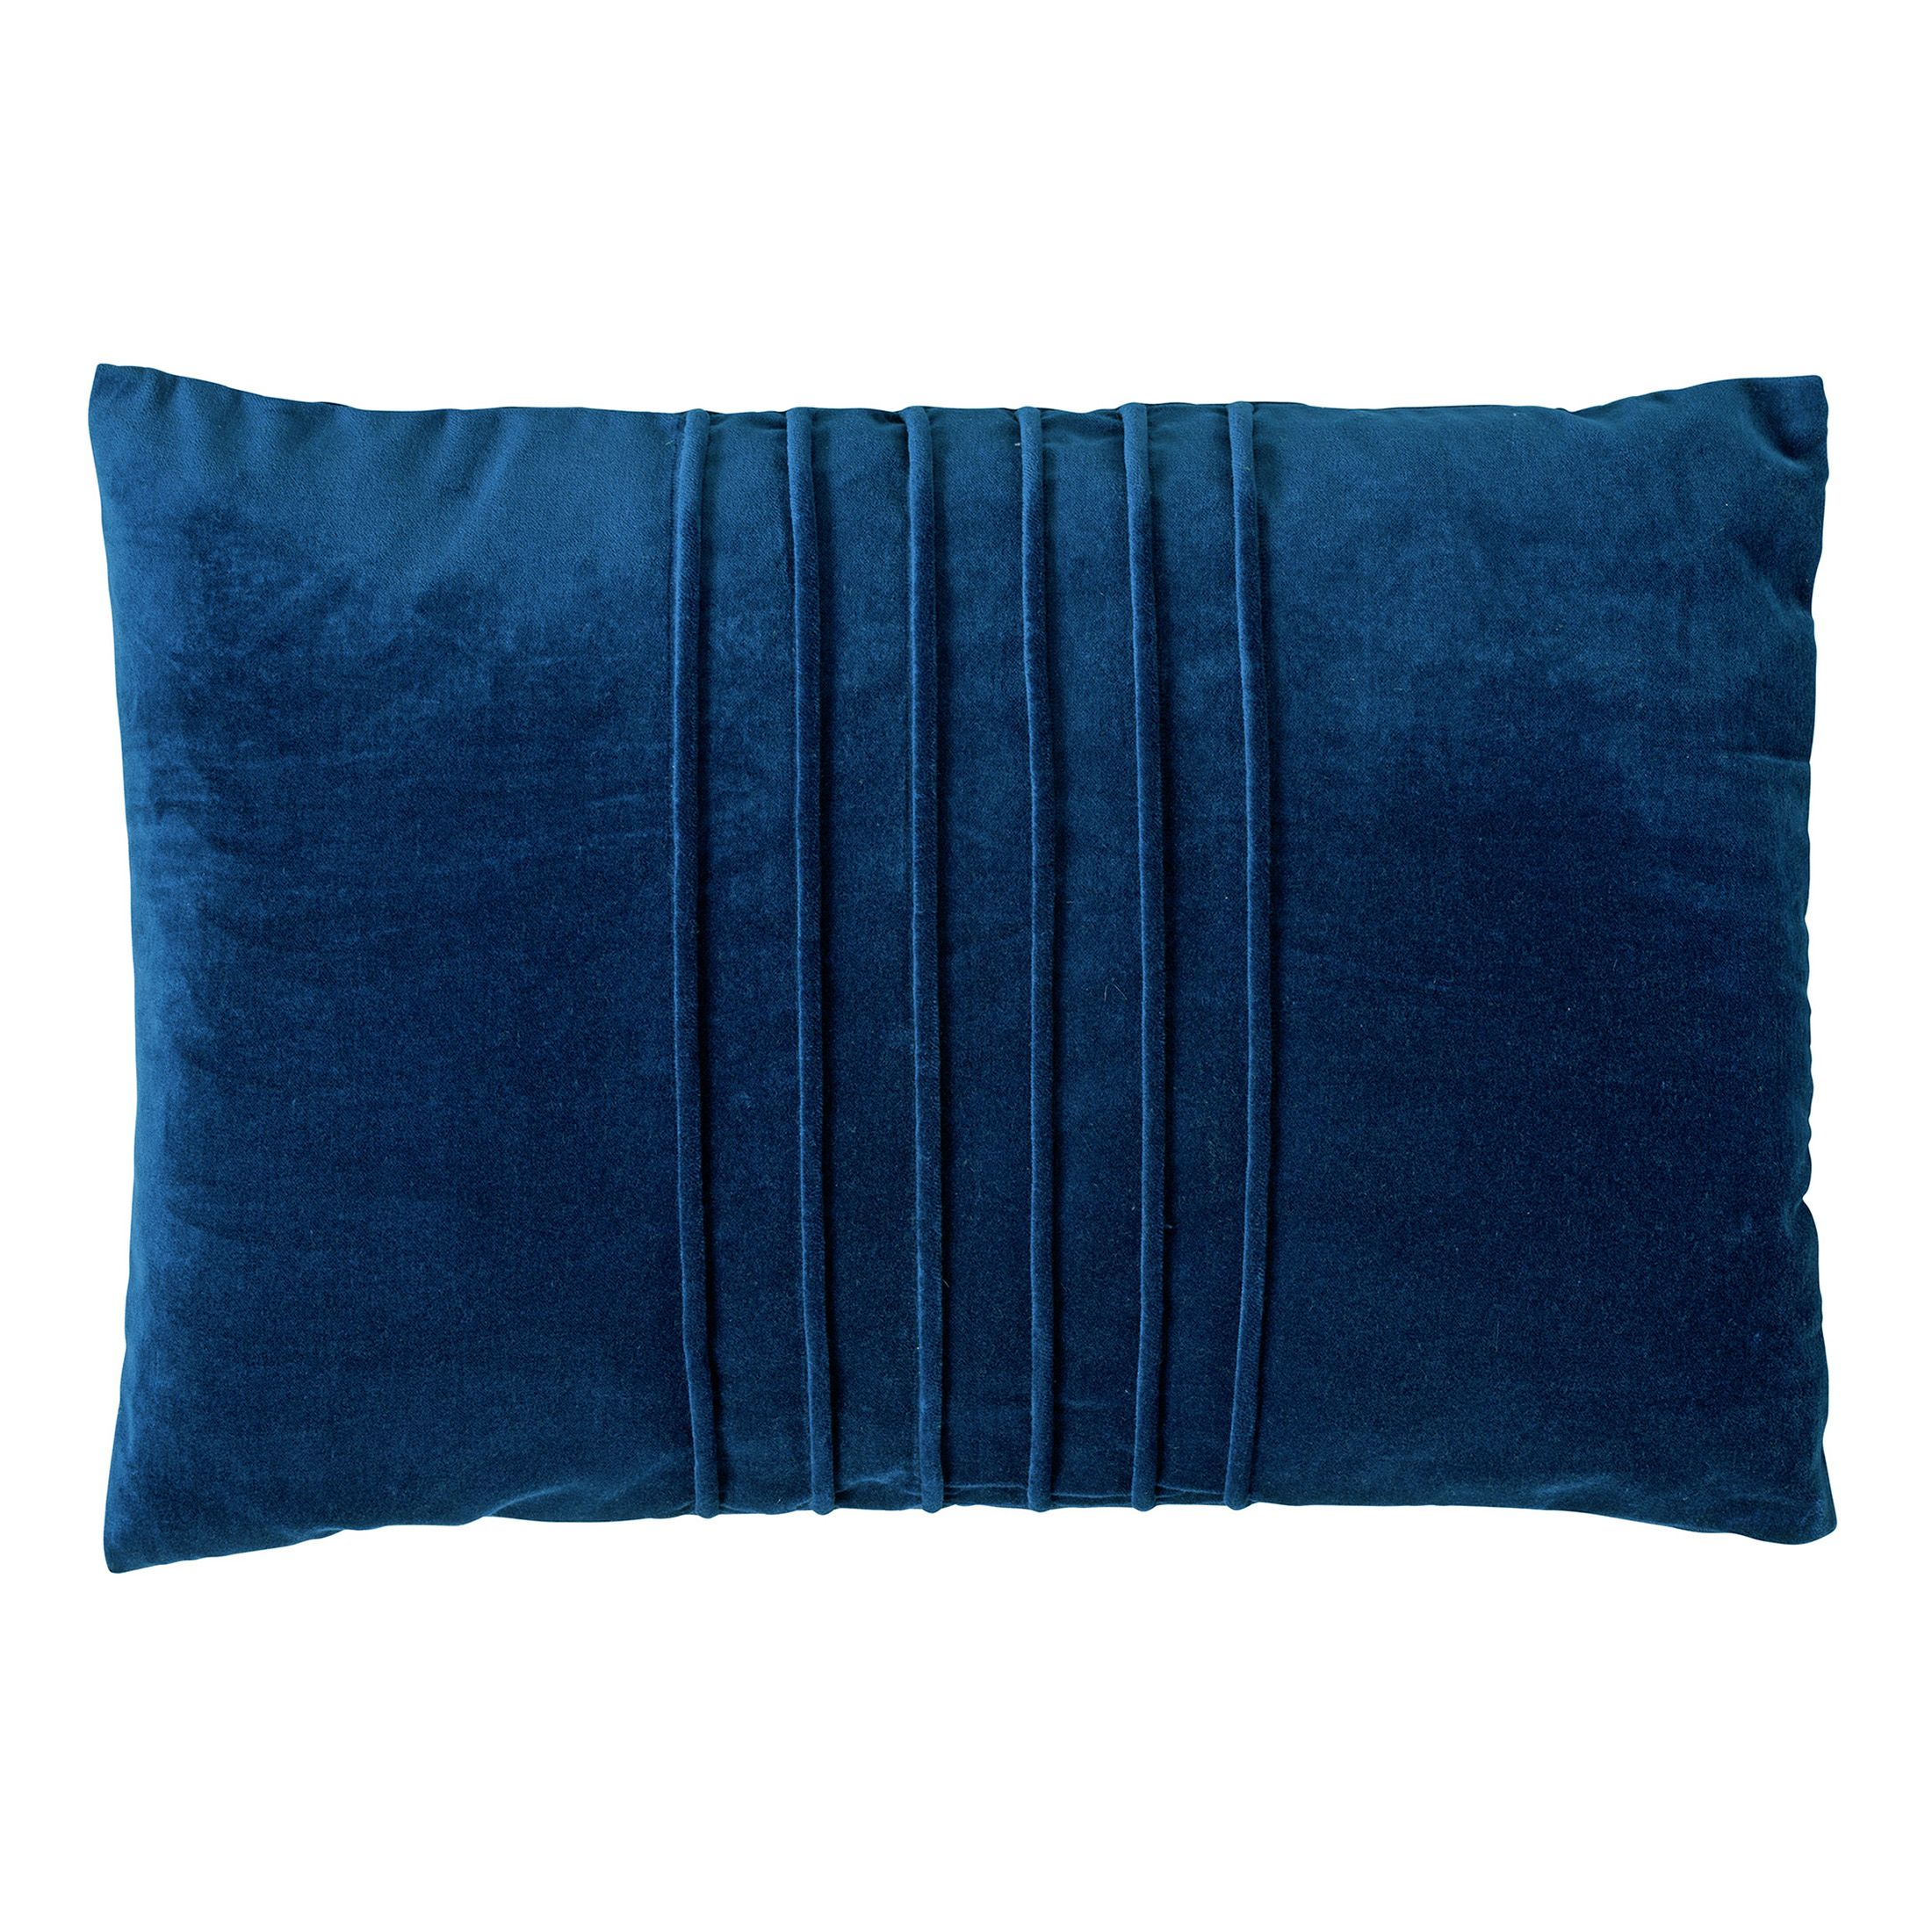 Coussin en velours Bleu saphir 40x60